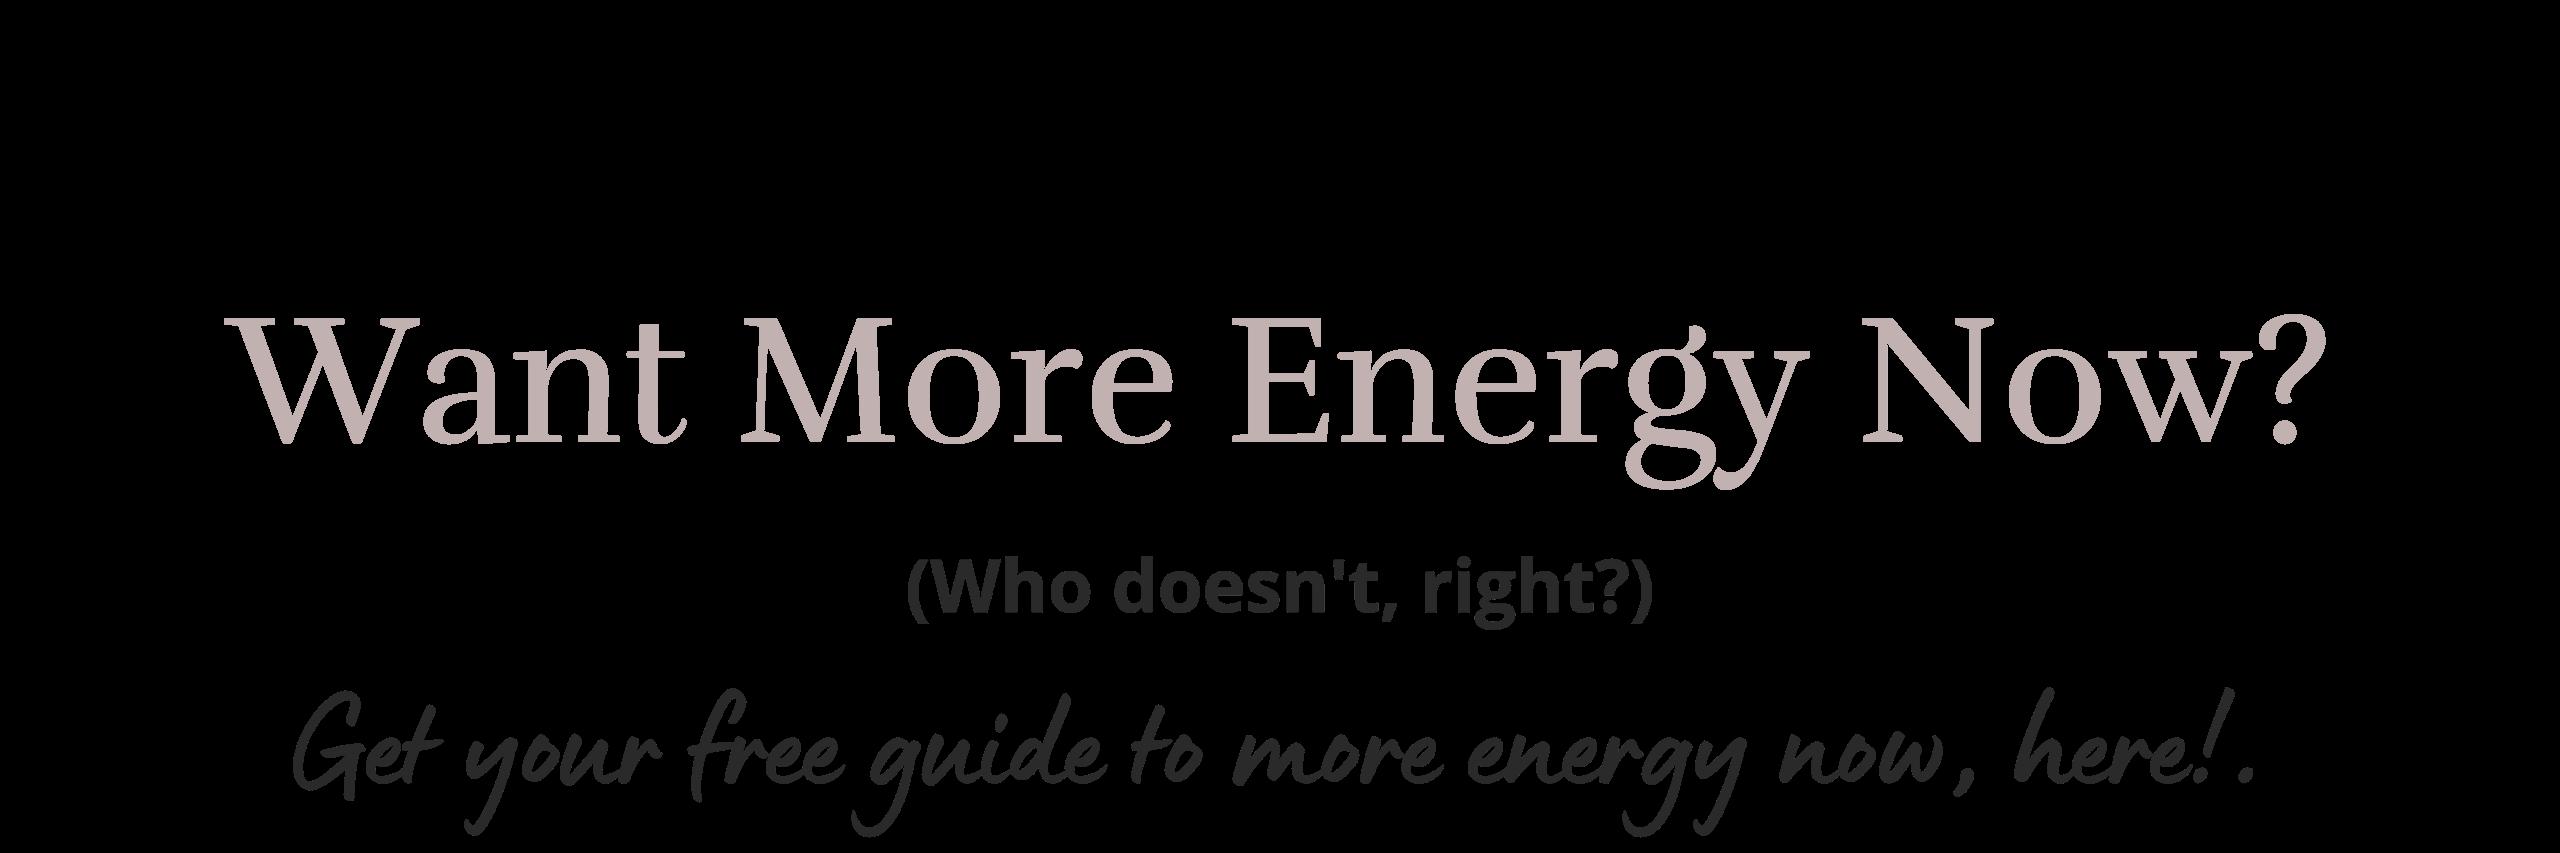 Get more energy with Kristen Blake Wellness.